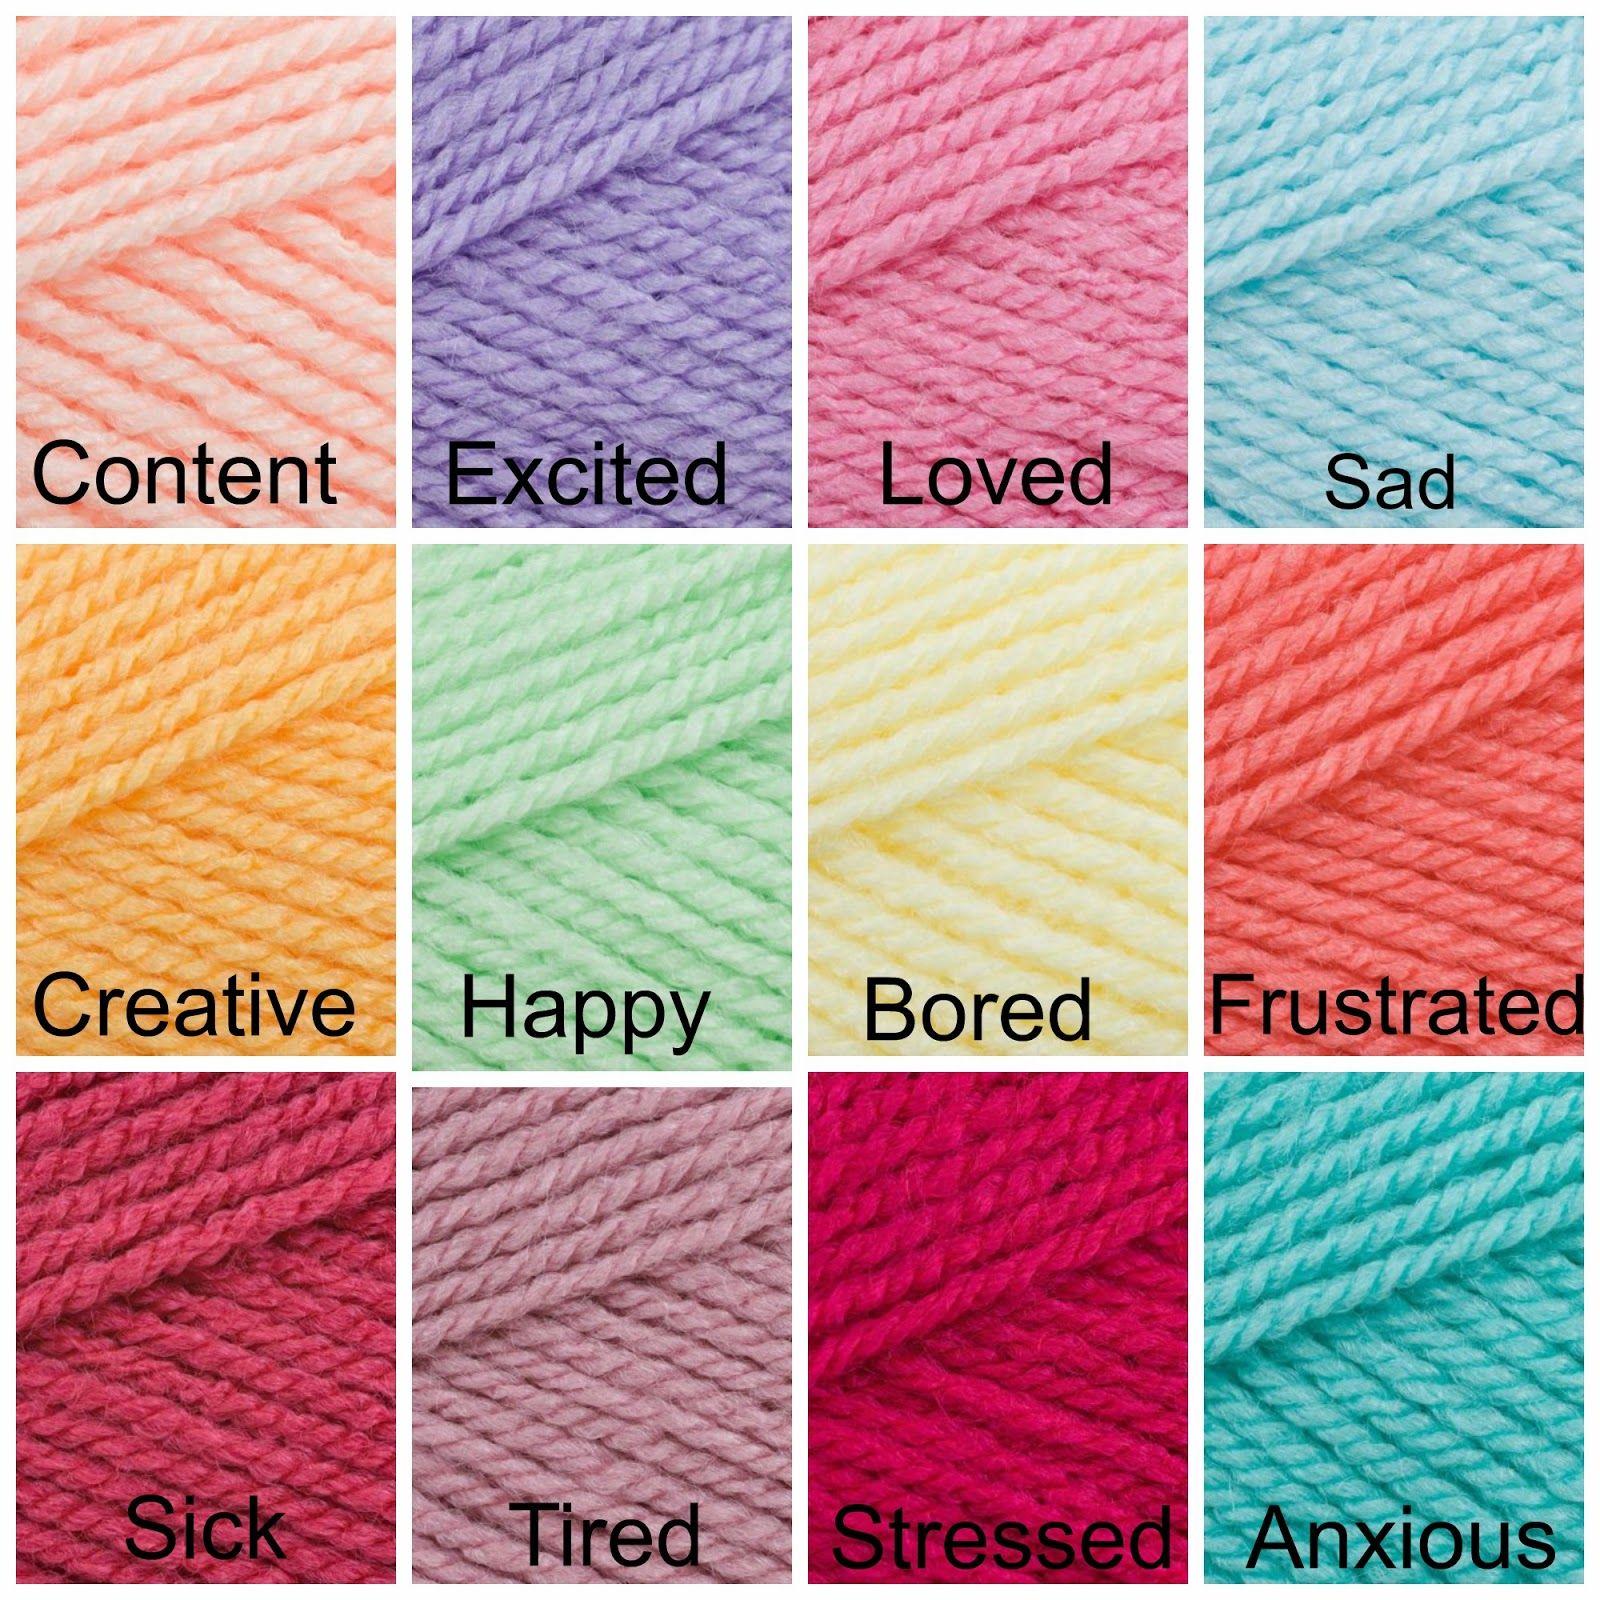 Stitch-a-llama: Crochet mood blanket challenge 2015   blanket galore ...